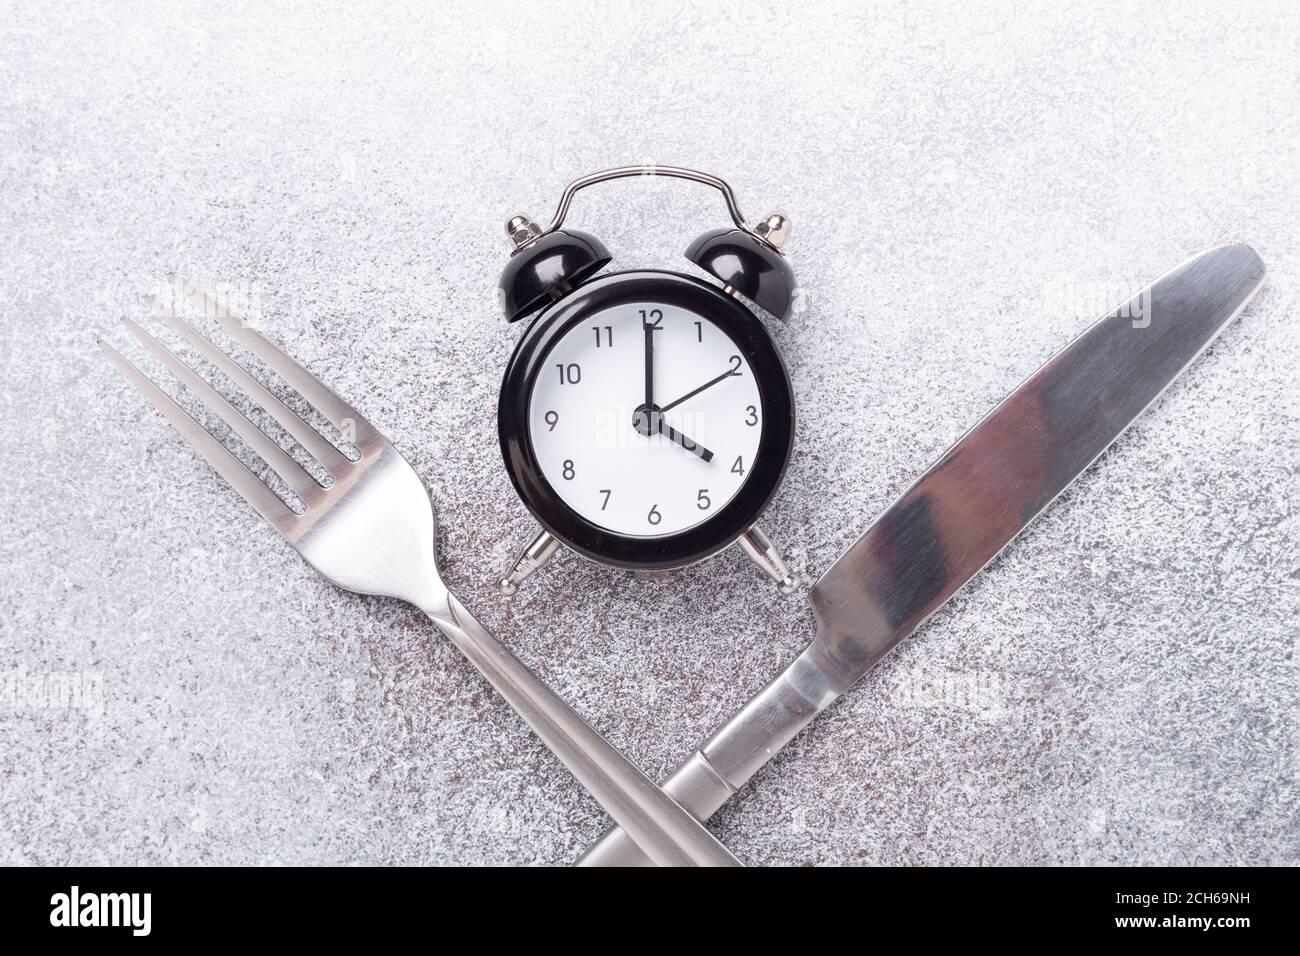 Black alarm clock, fork, knife on dark background. Intermittent fasting concept - Image Stock Photo